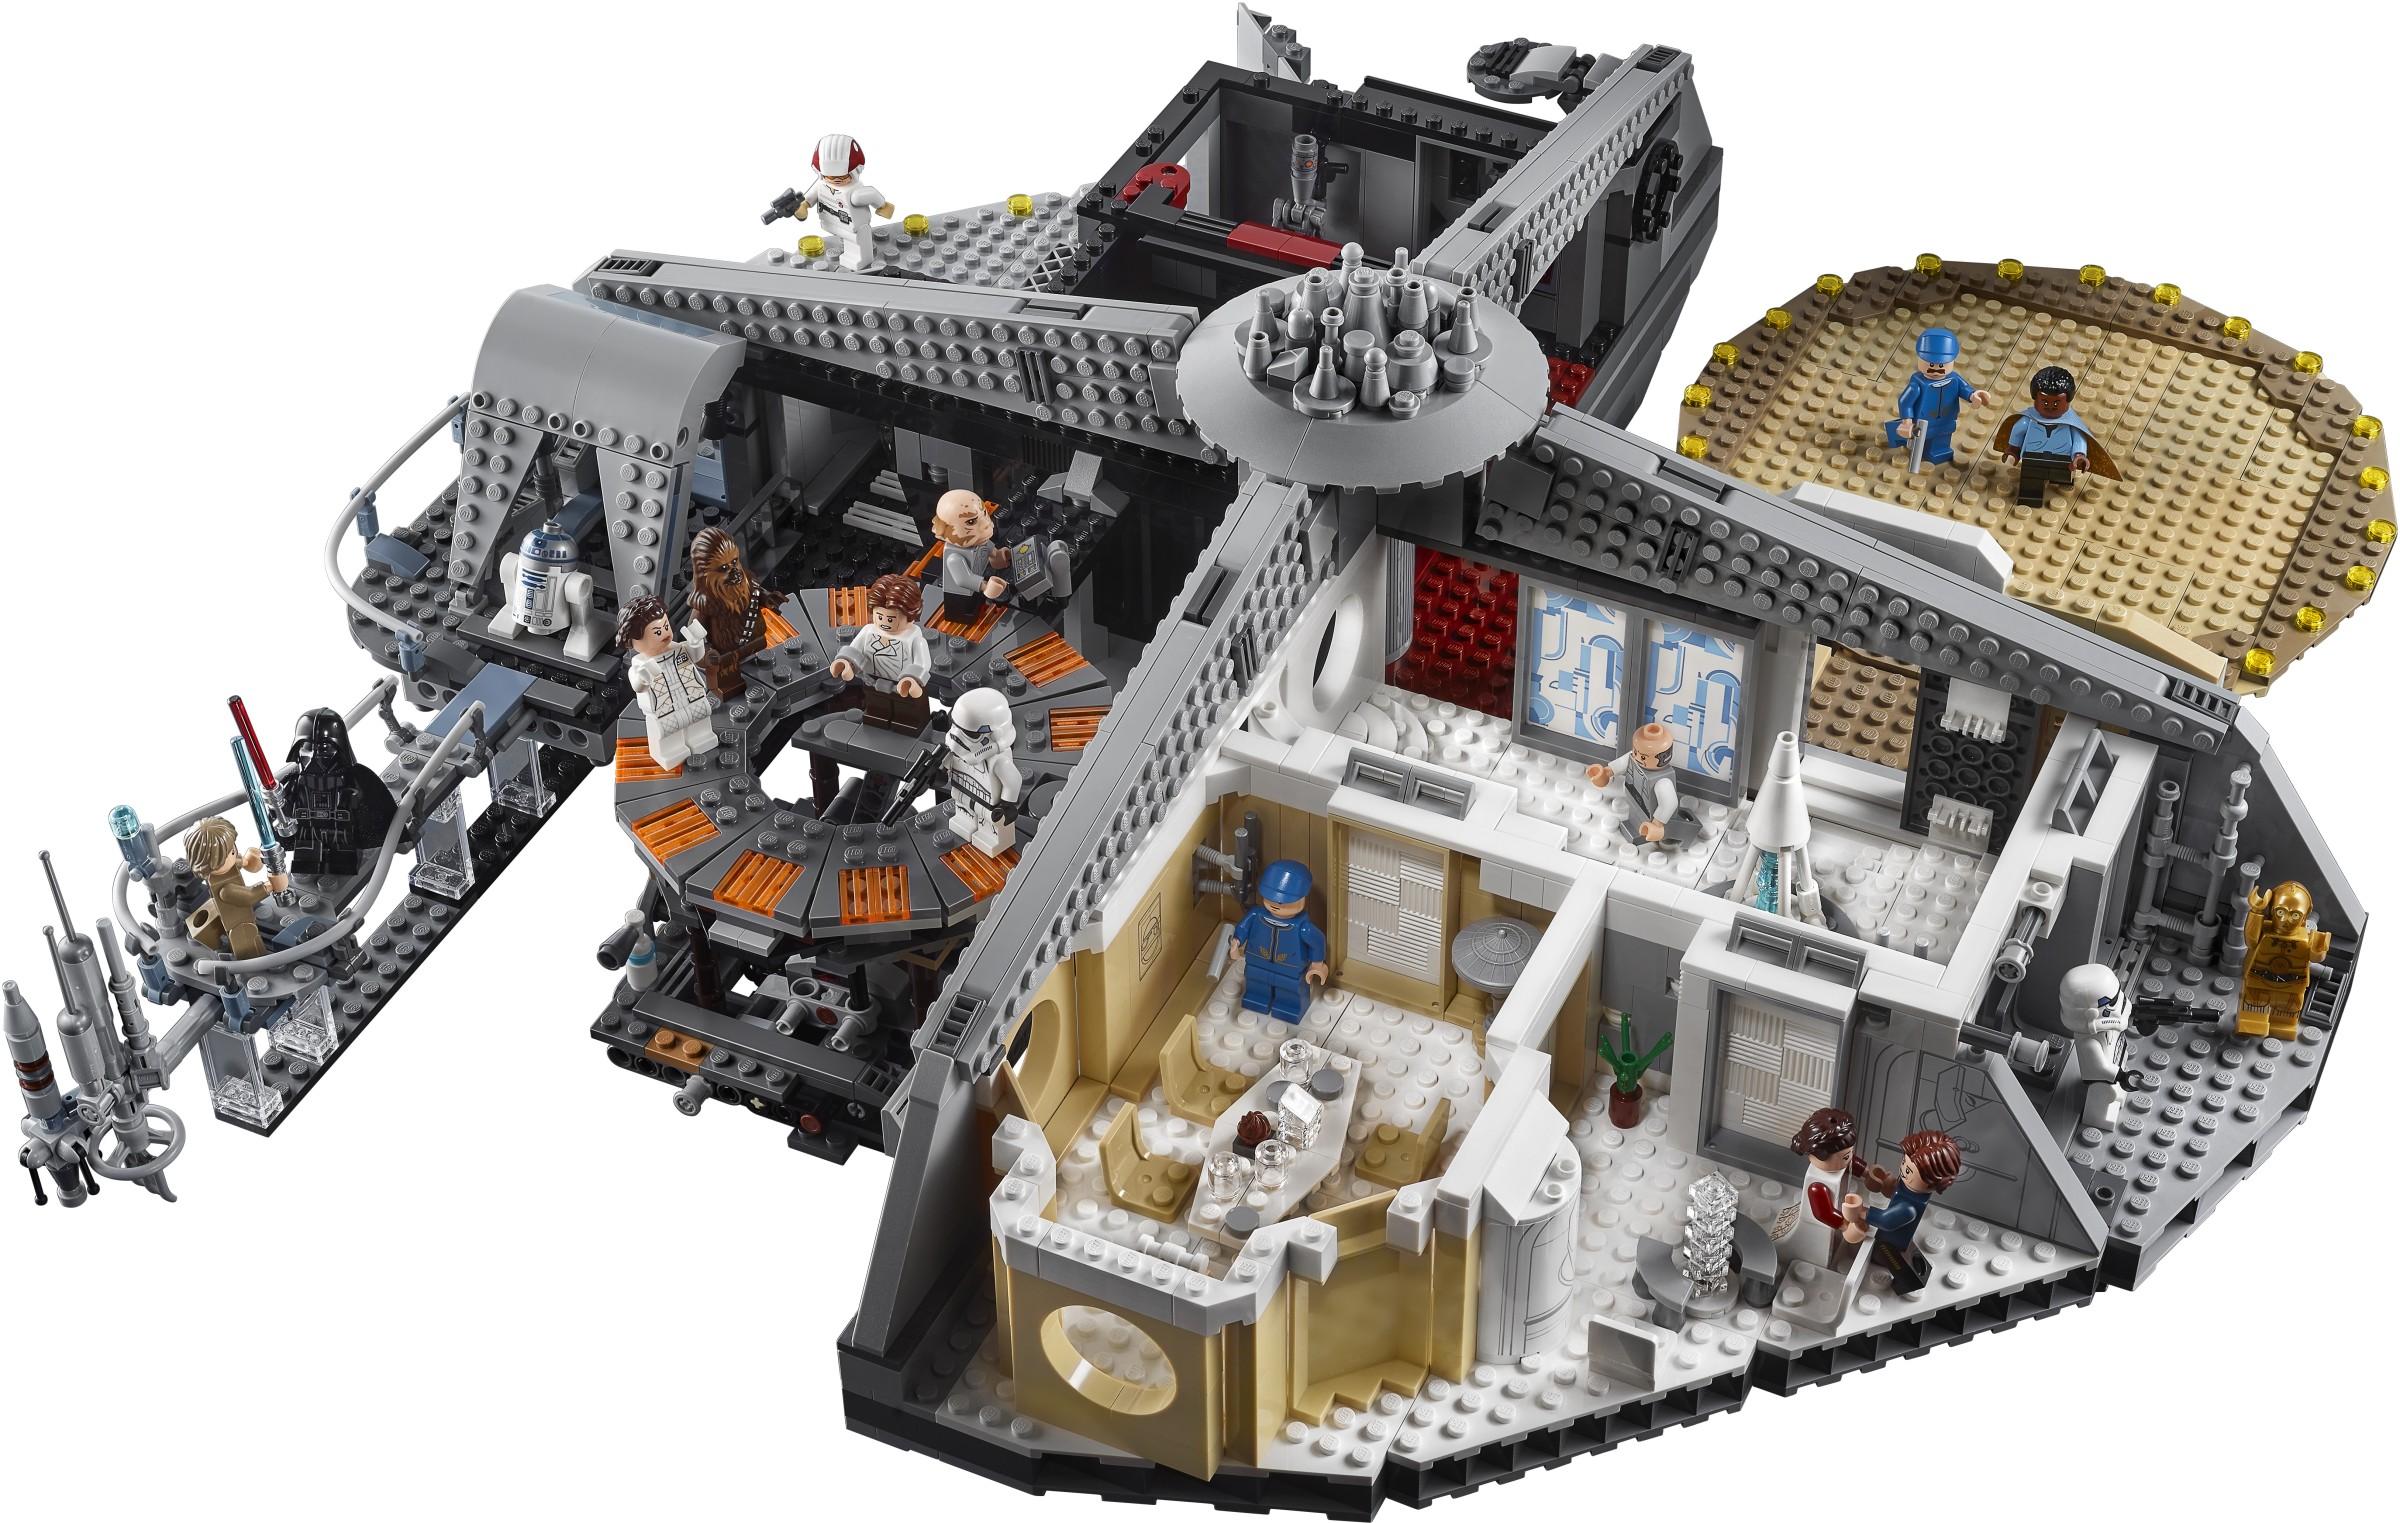 Preview 75222 Betrayal At Cloud City Brickset Lego Set Guide And